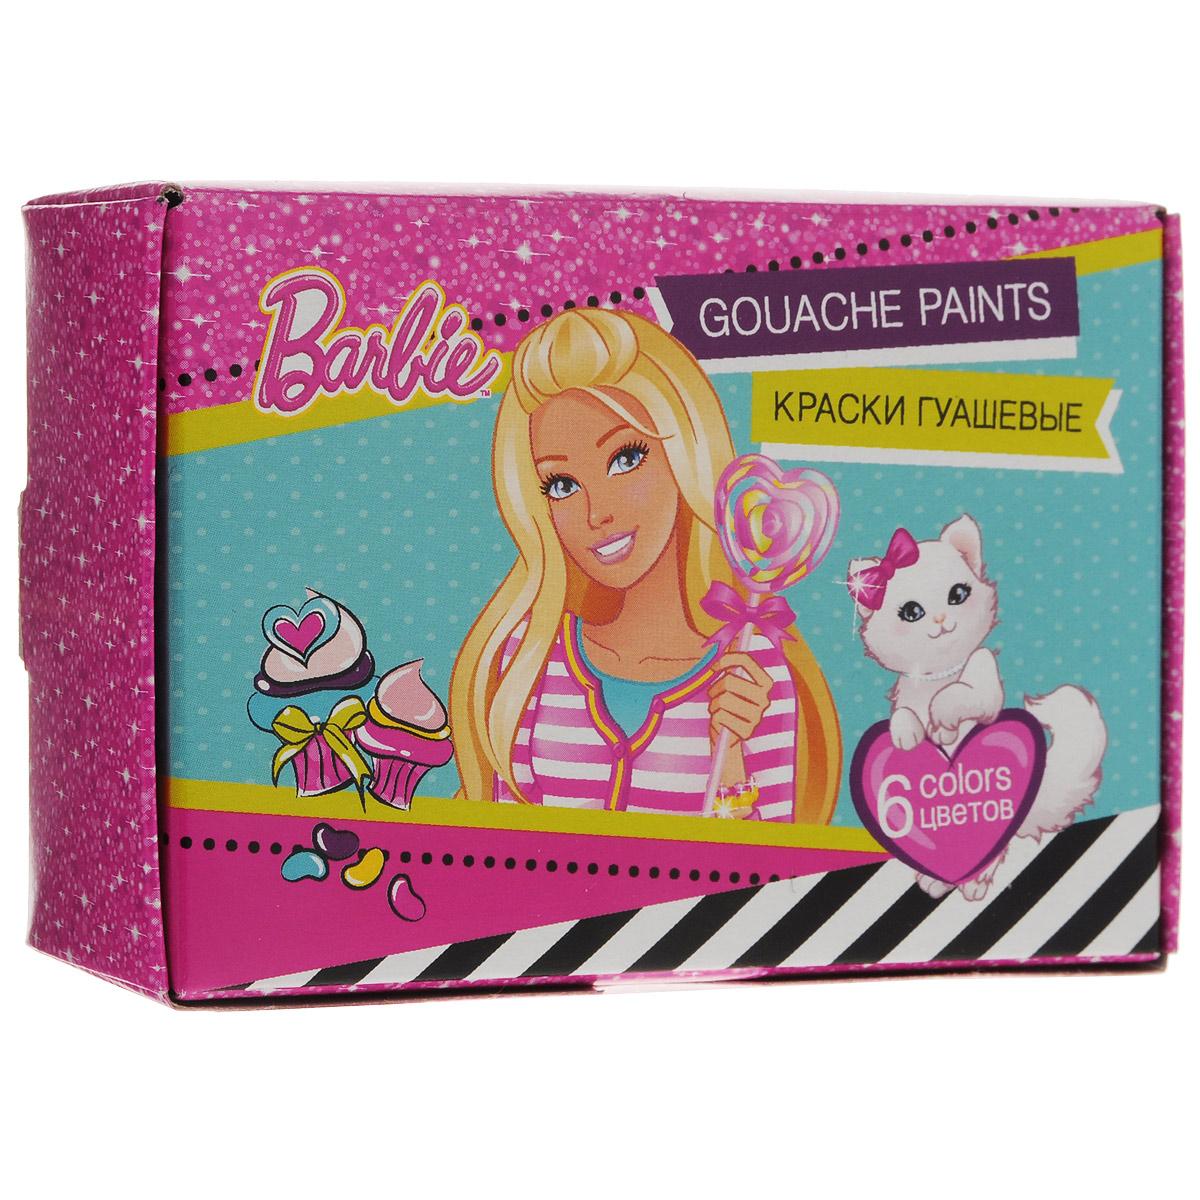 "Краски гуашевые ""Barbie"", 6 цветов. BRCB-US1-GU-6"